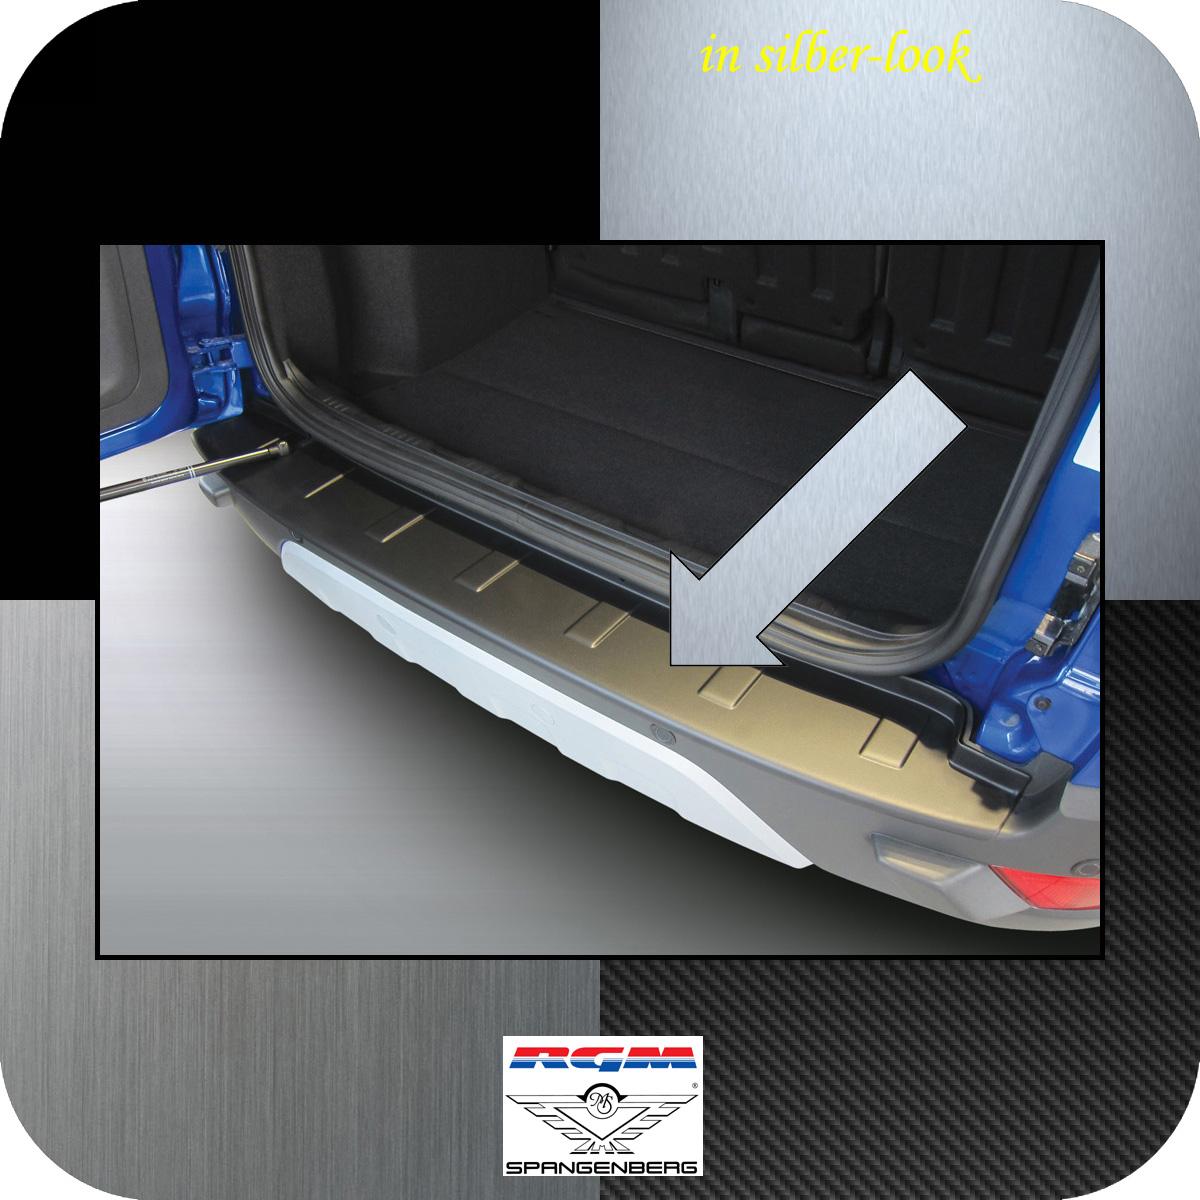 Ladekantenschutz Silber-Look Ford EcoSport SUV Kombi vor Mopf 2012-17 3506814